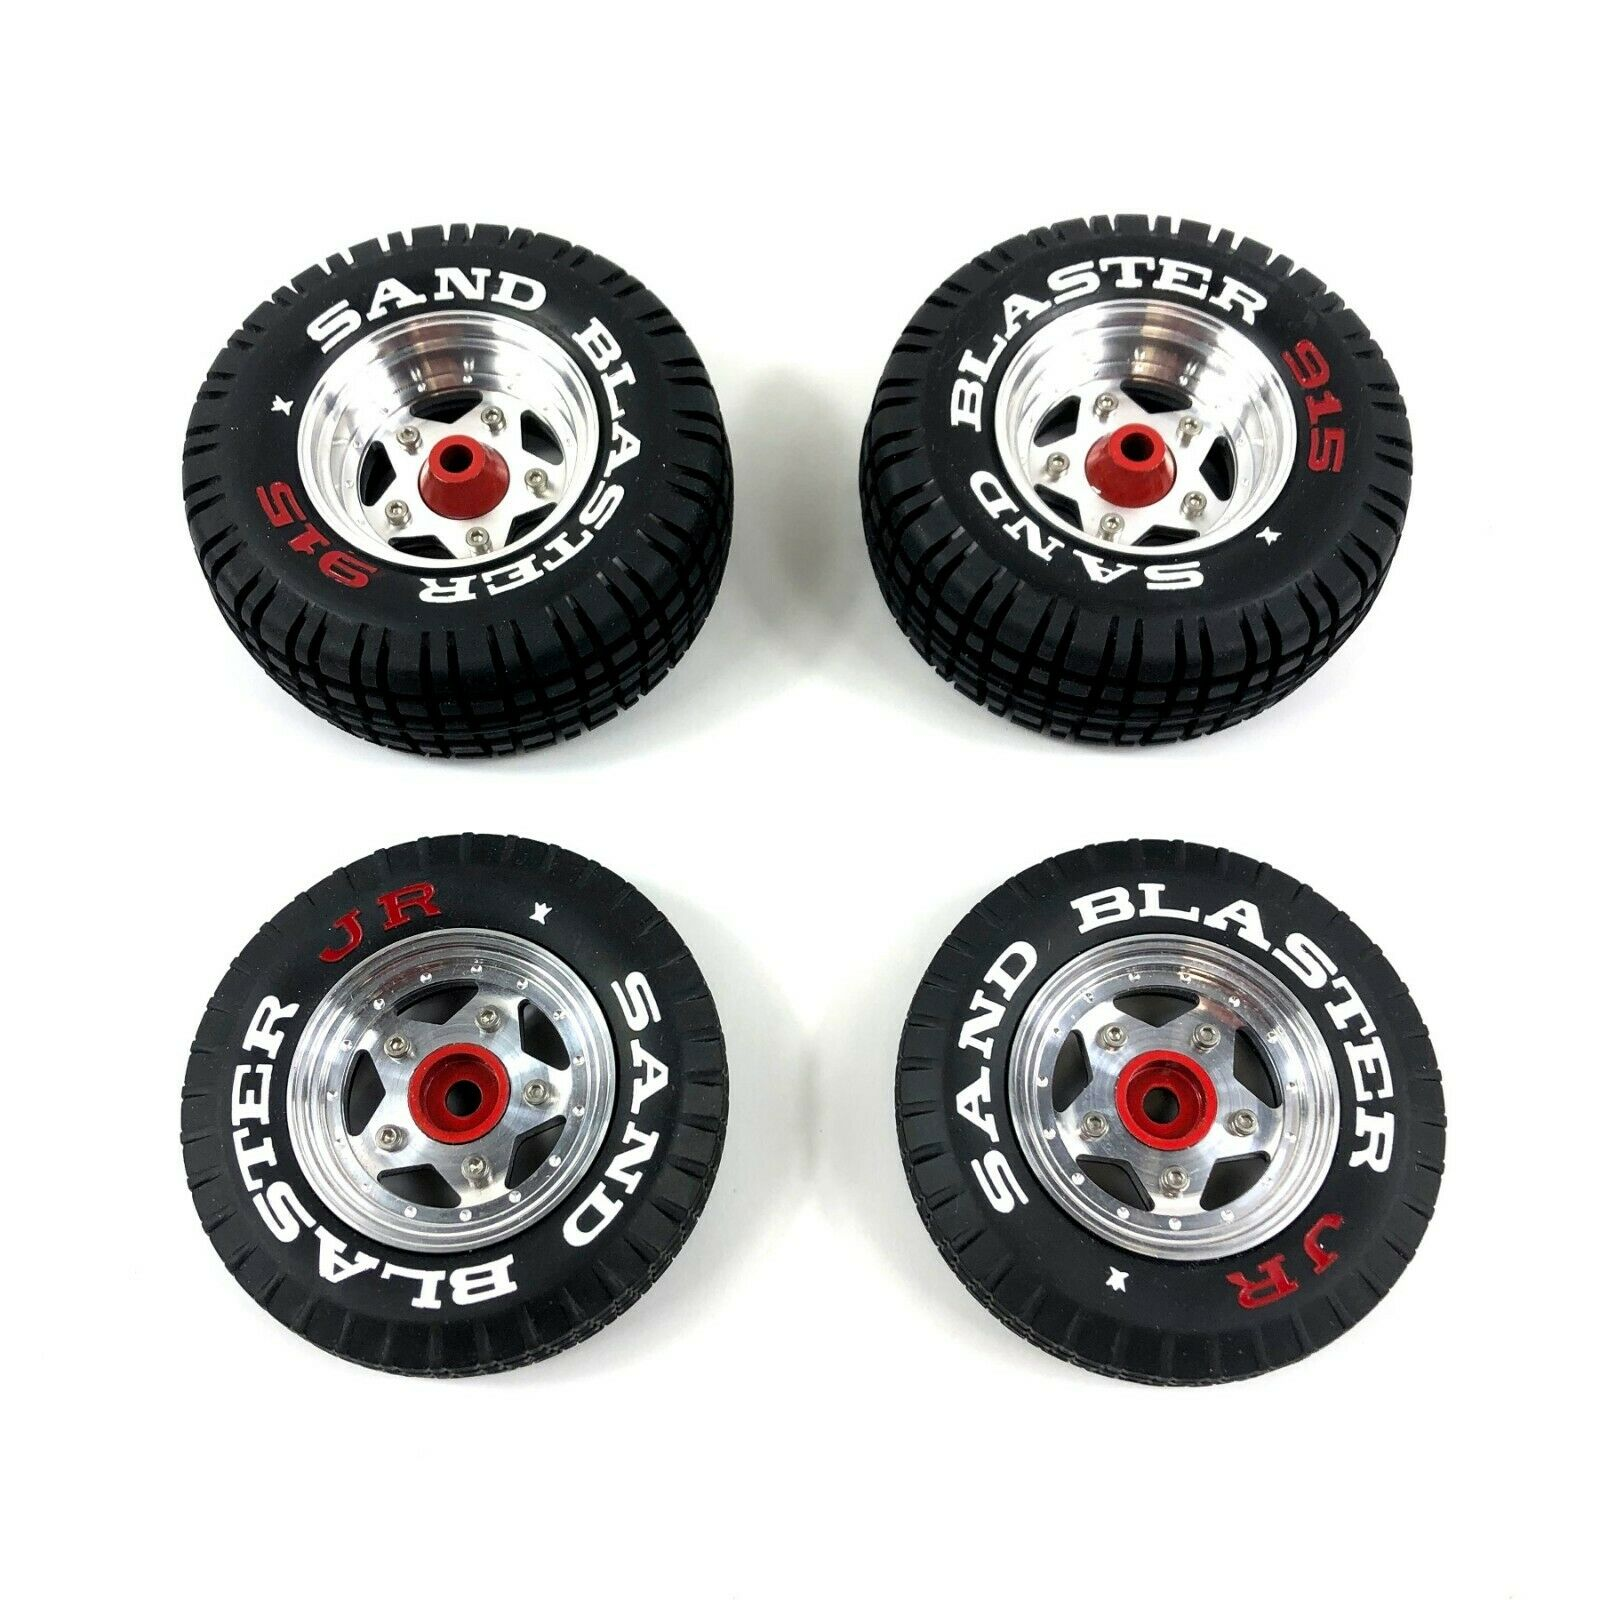 Rare Alloy Wheel Rim & Painted Sand Blaster Tire Set for